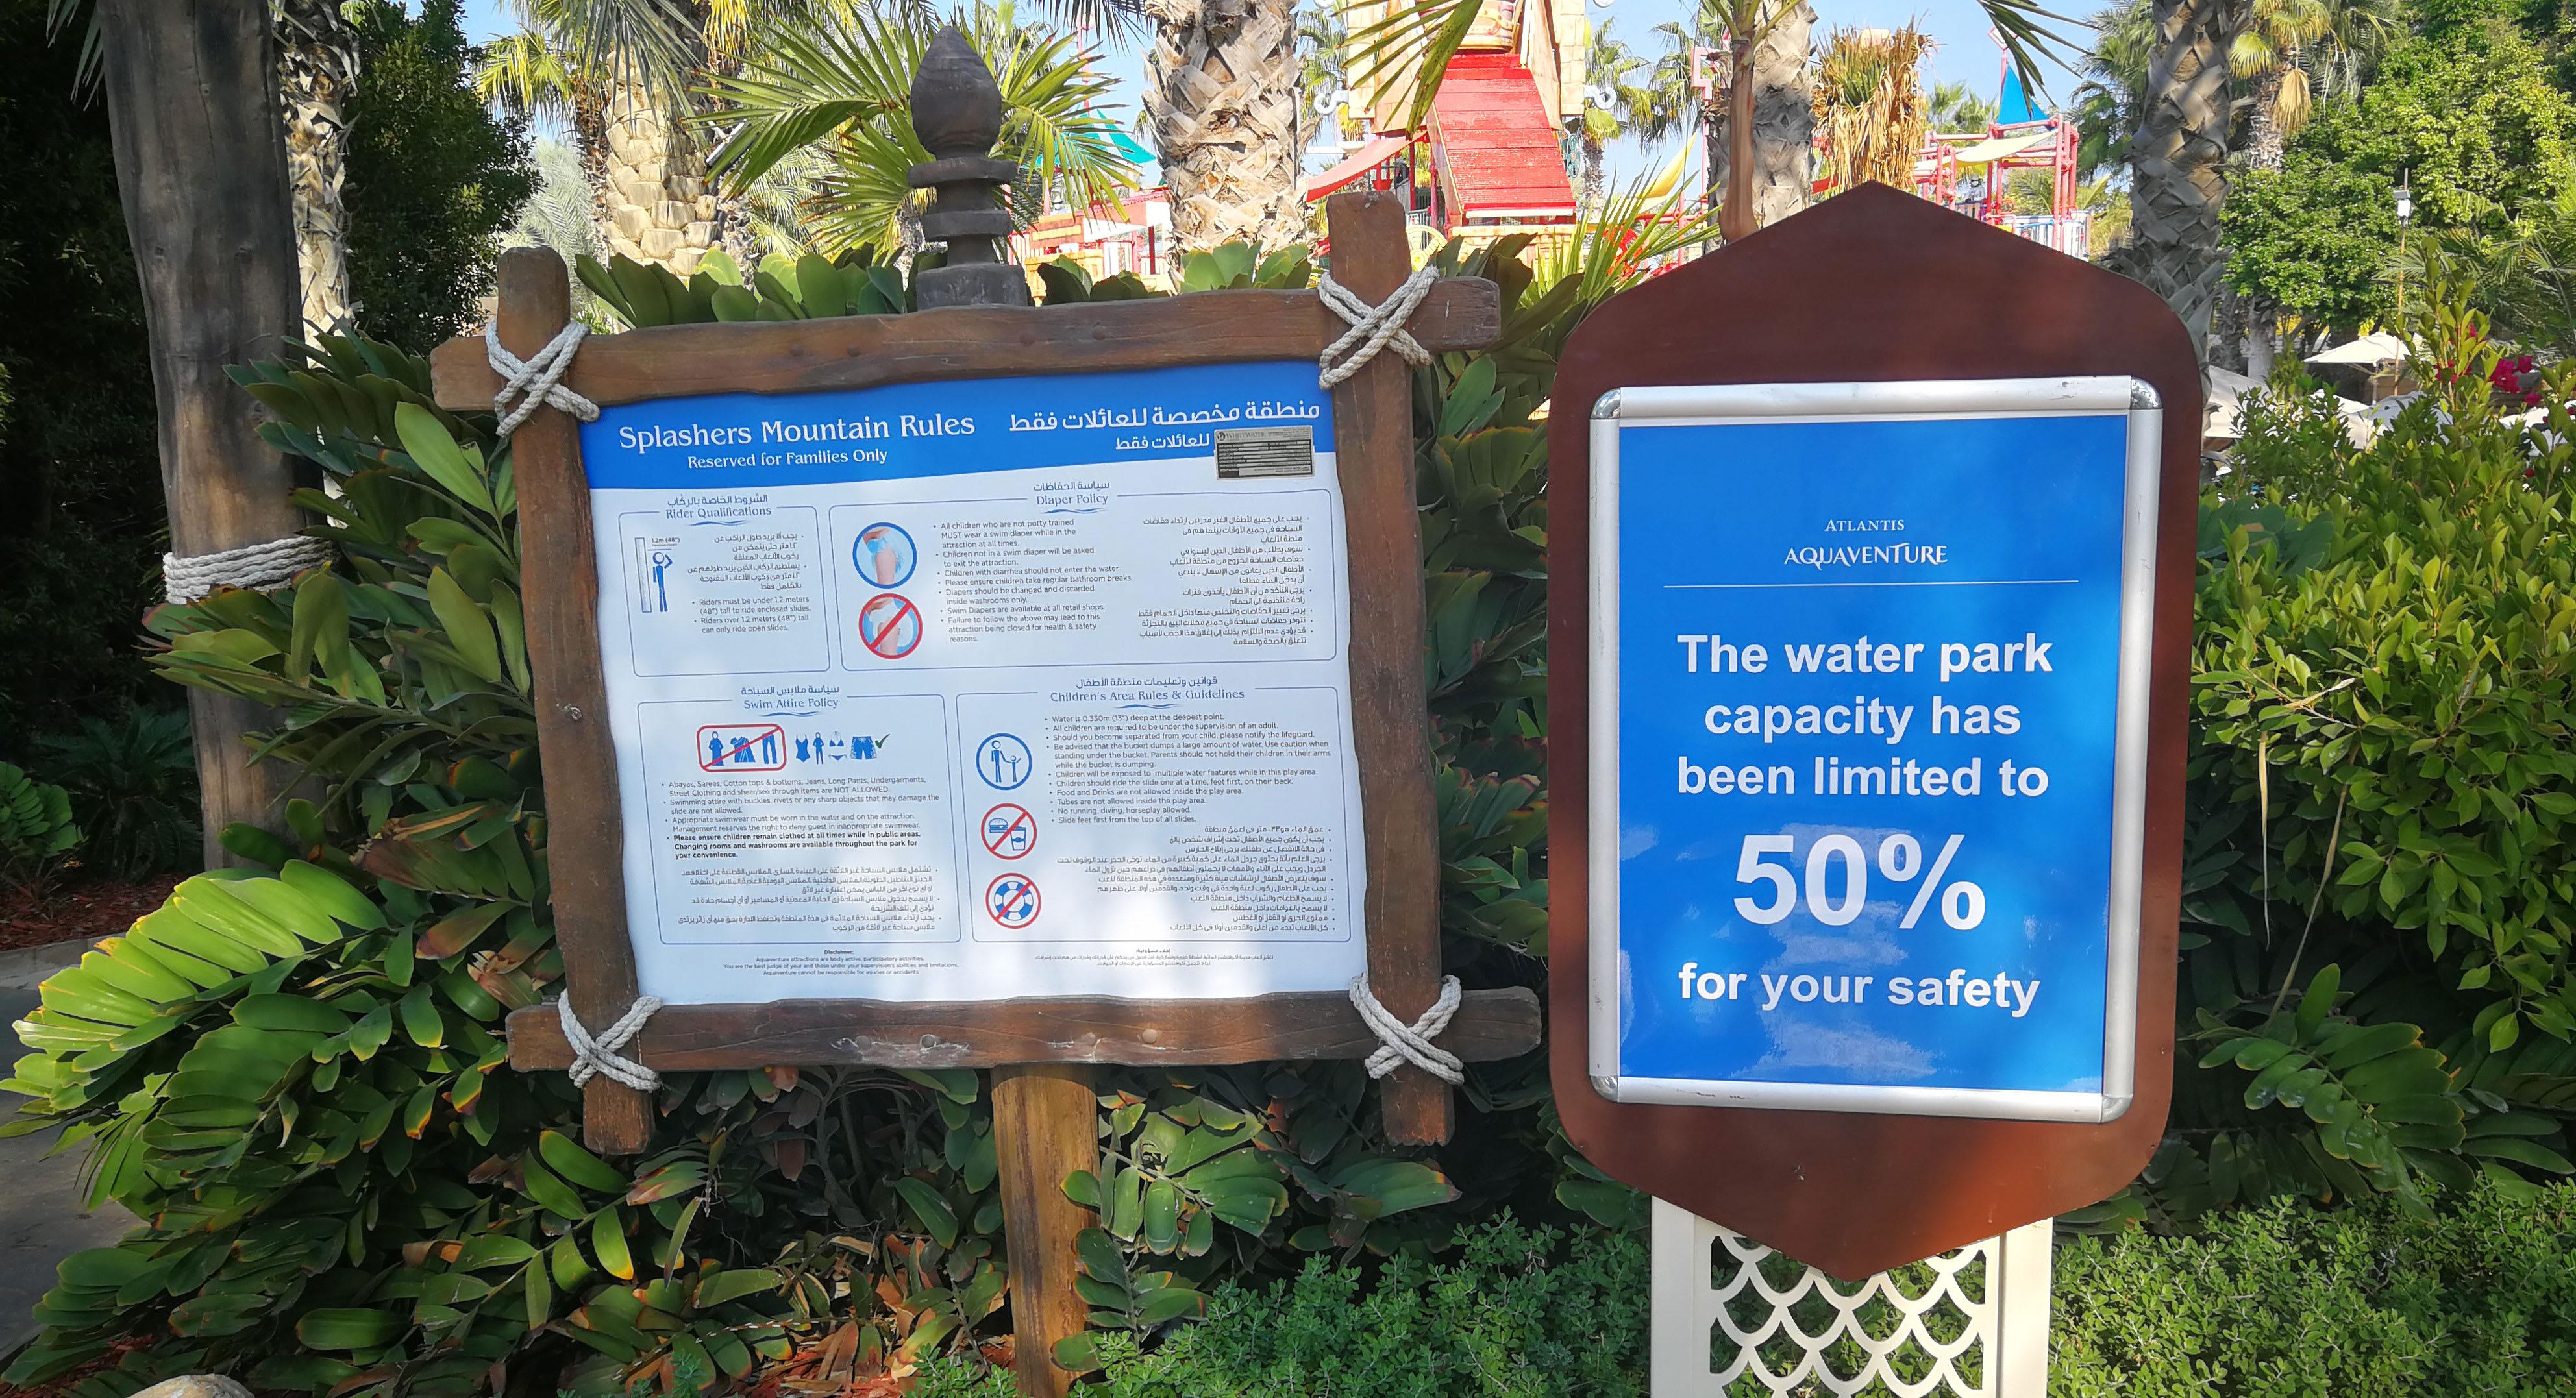 Signage at Aquaventure waterpark